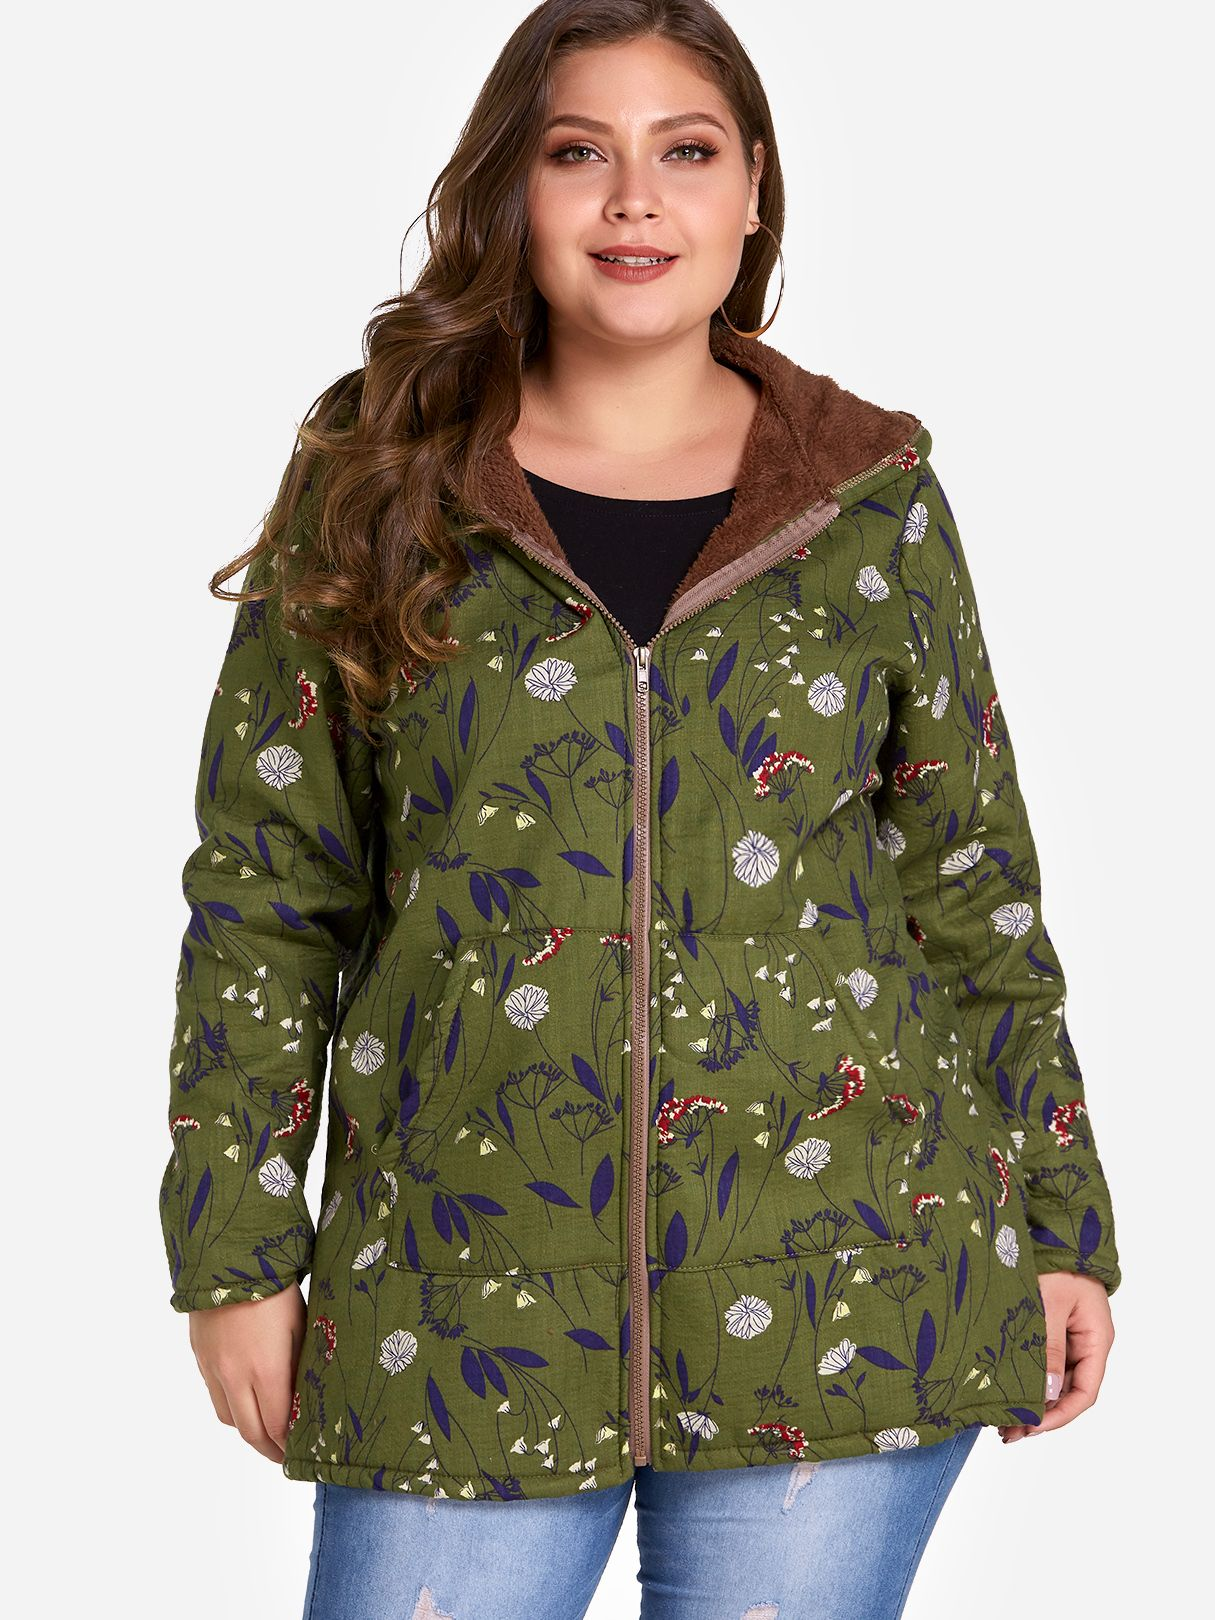 Womens Jacket Plus Size Green Hooded Design Random Floral Print Coat Click To Buy Affiliatelink Ad Womens Jacket Fashion Print Coat Jackets For Women [ 1620 x 1215 Pixel ]